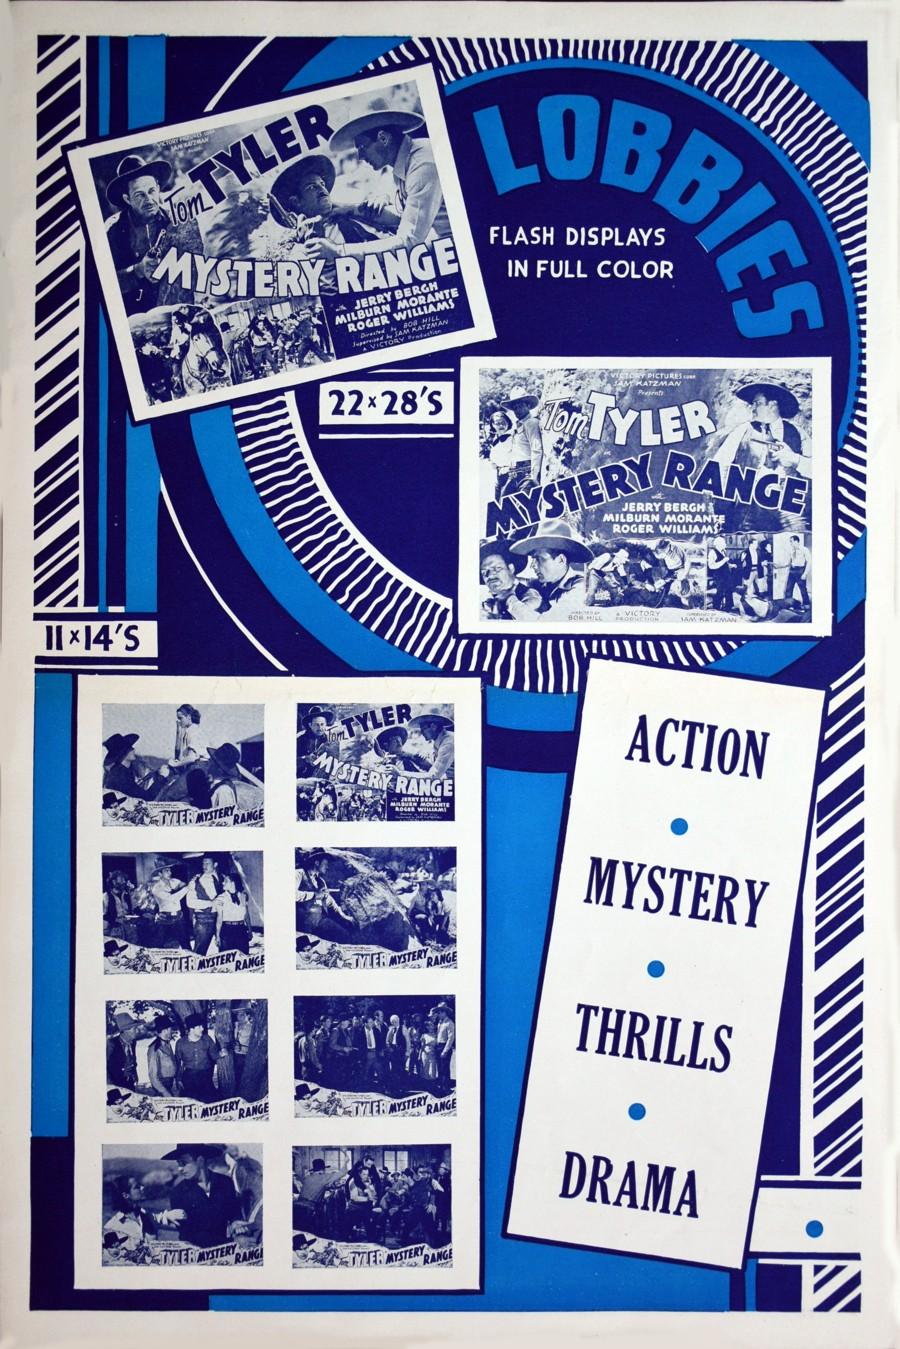 Mystery Range pressbook